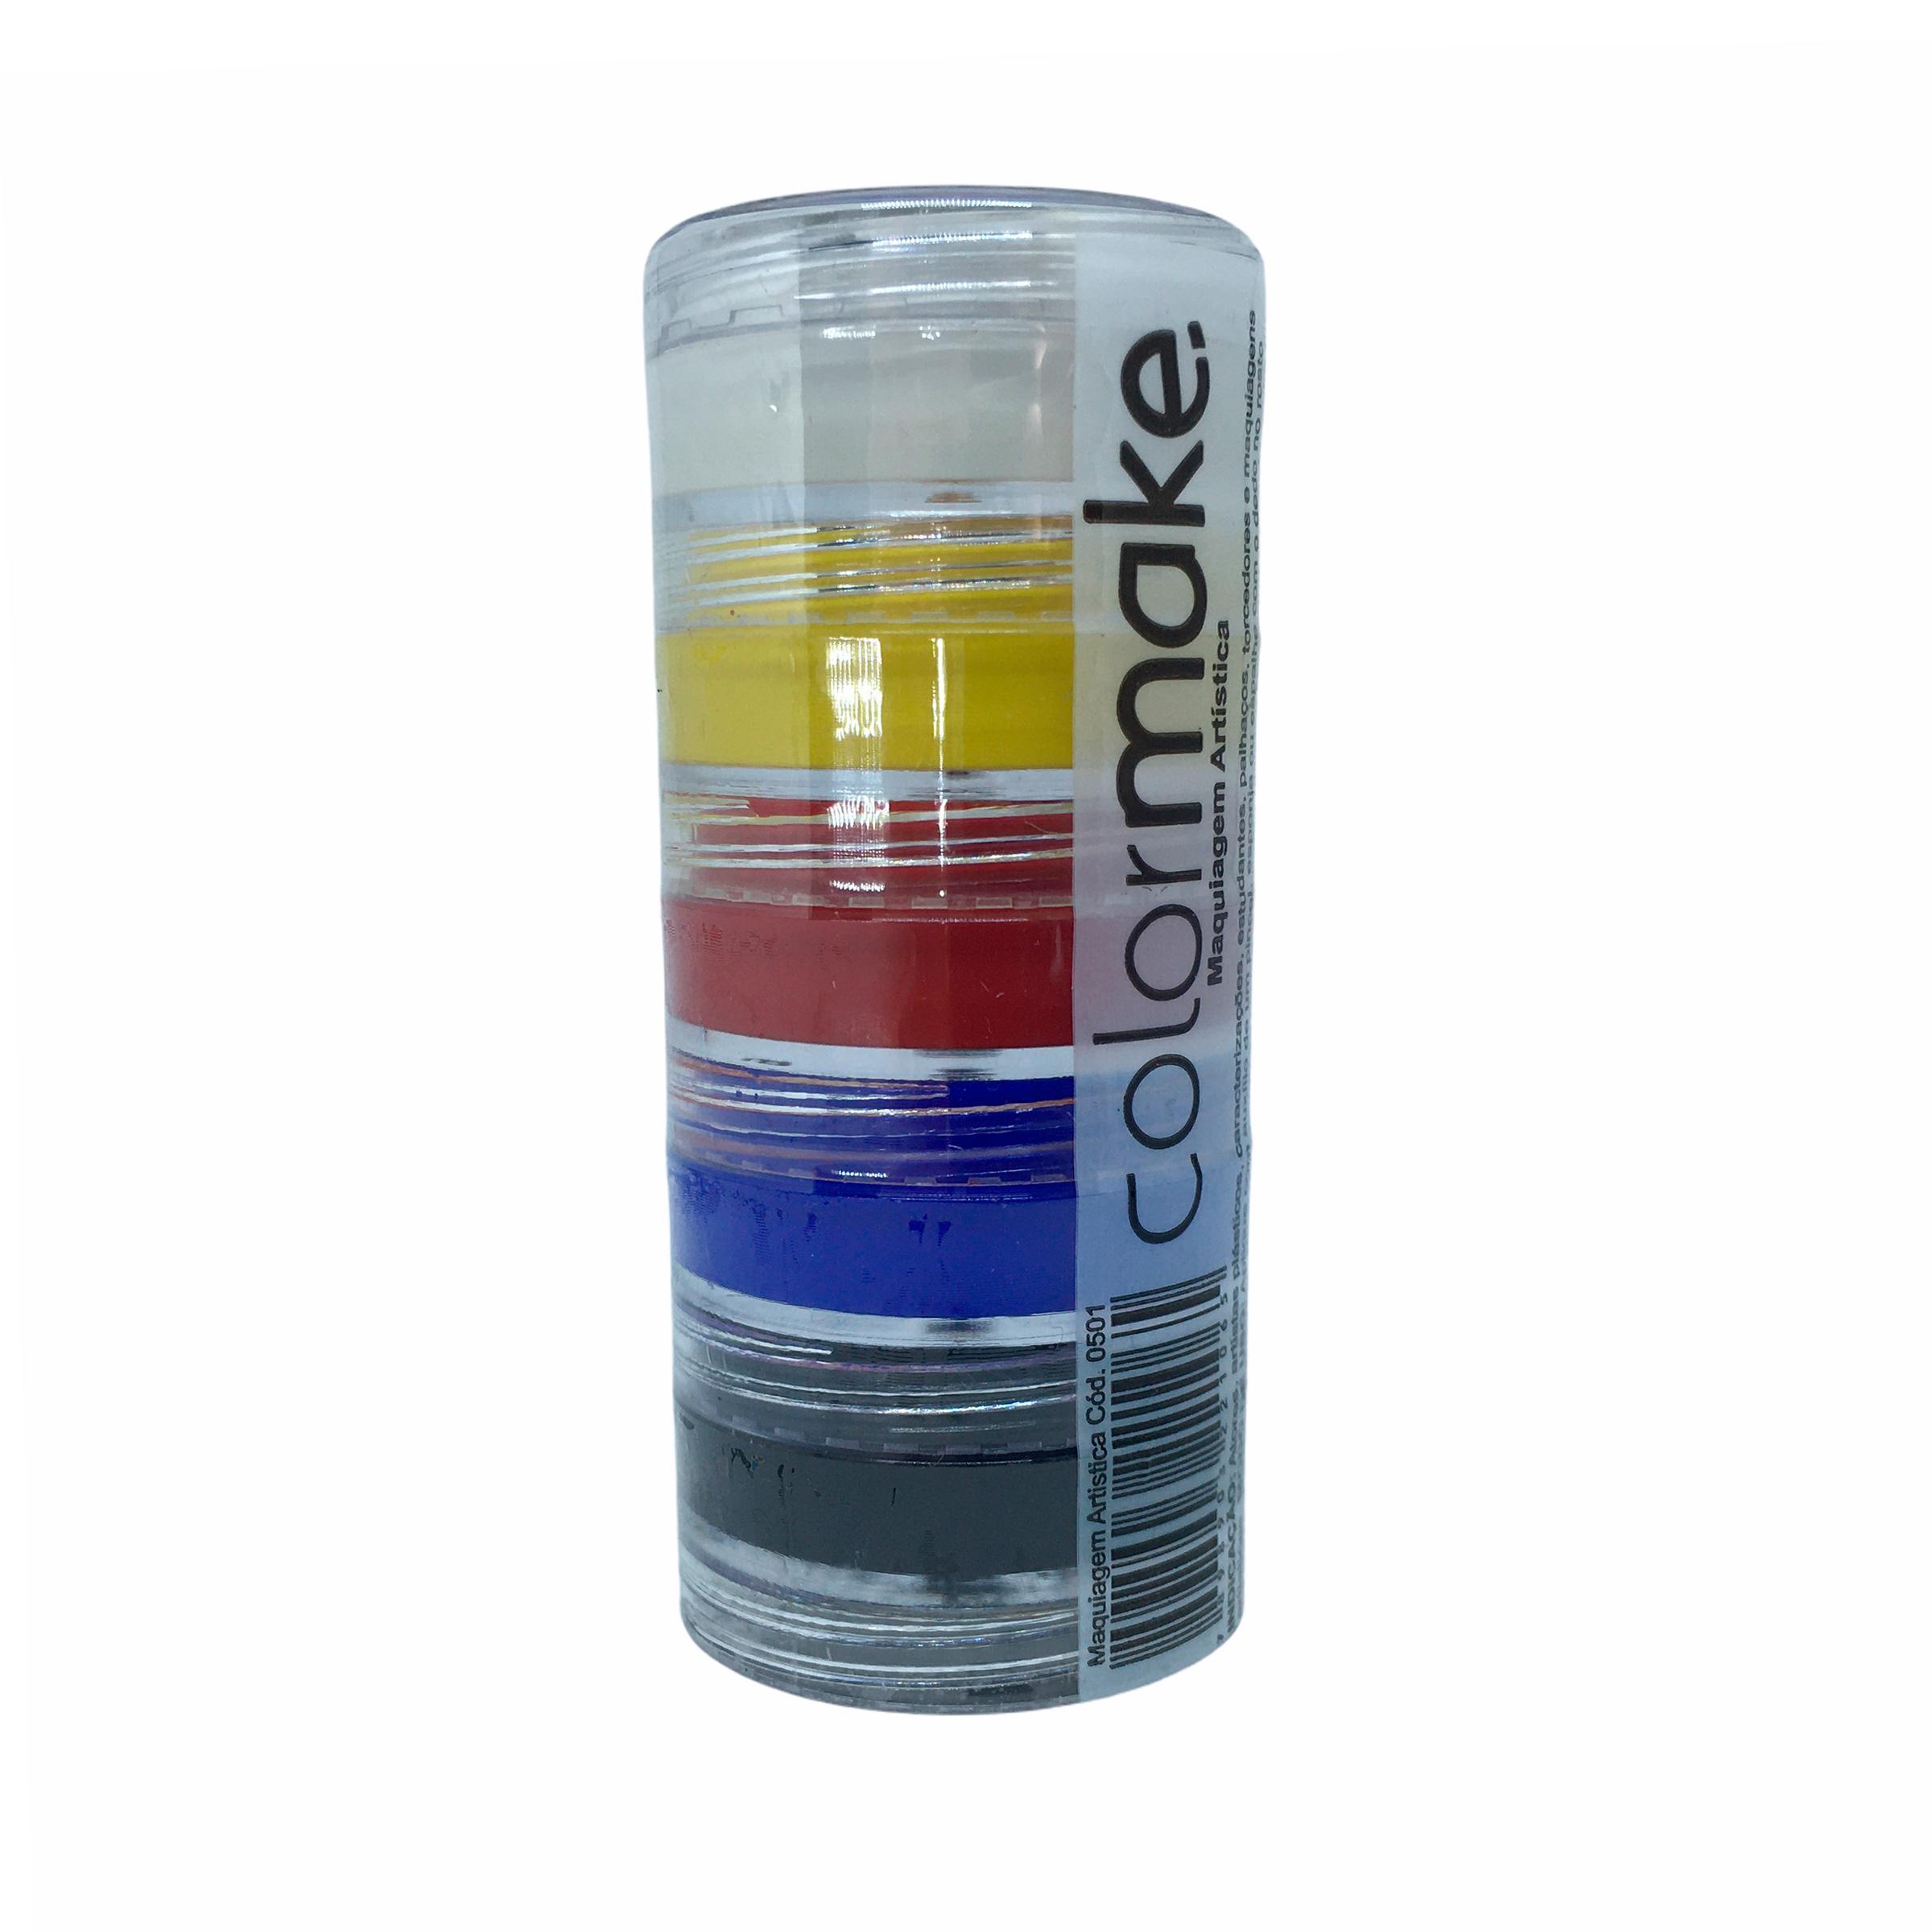 Tinta Cremosa Colormake 5 Cores - 4g (cada)